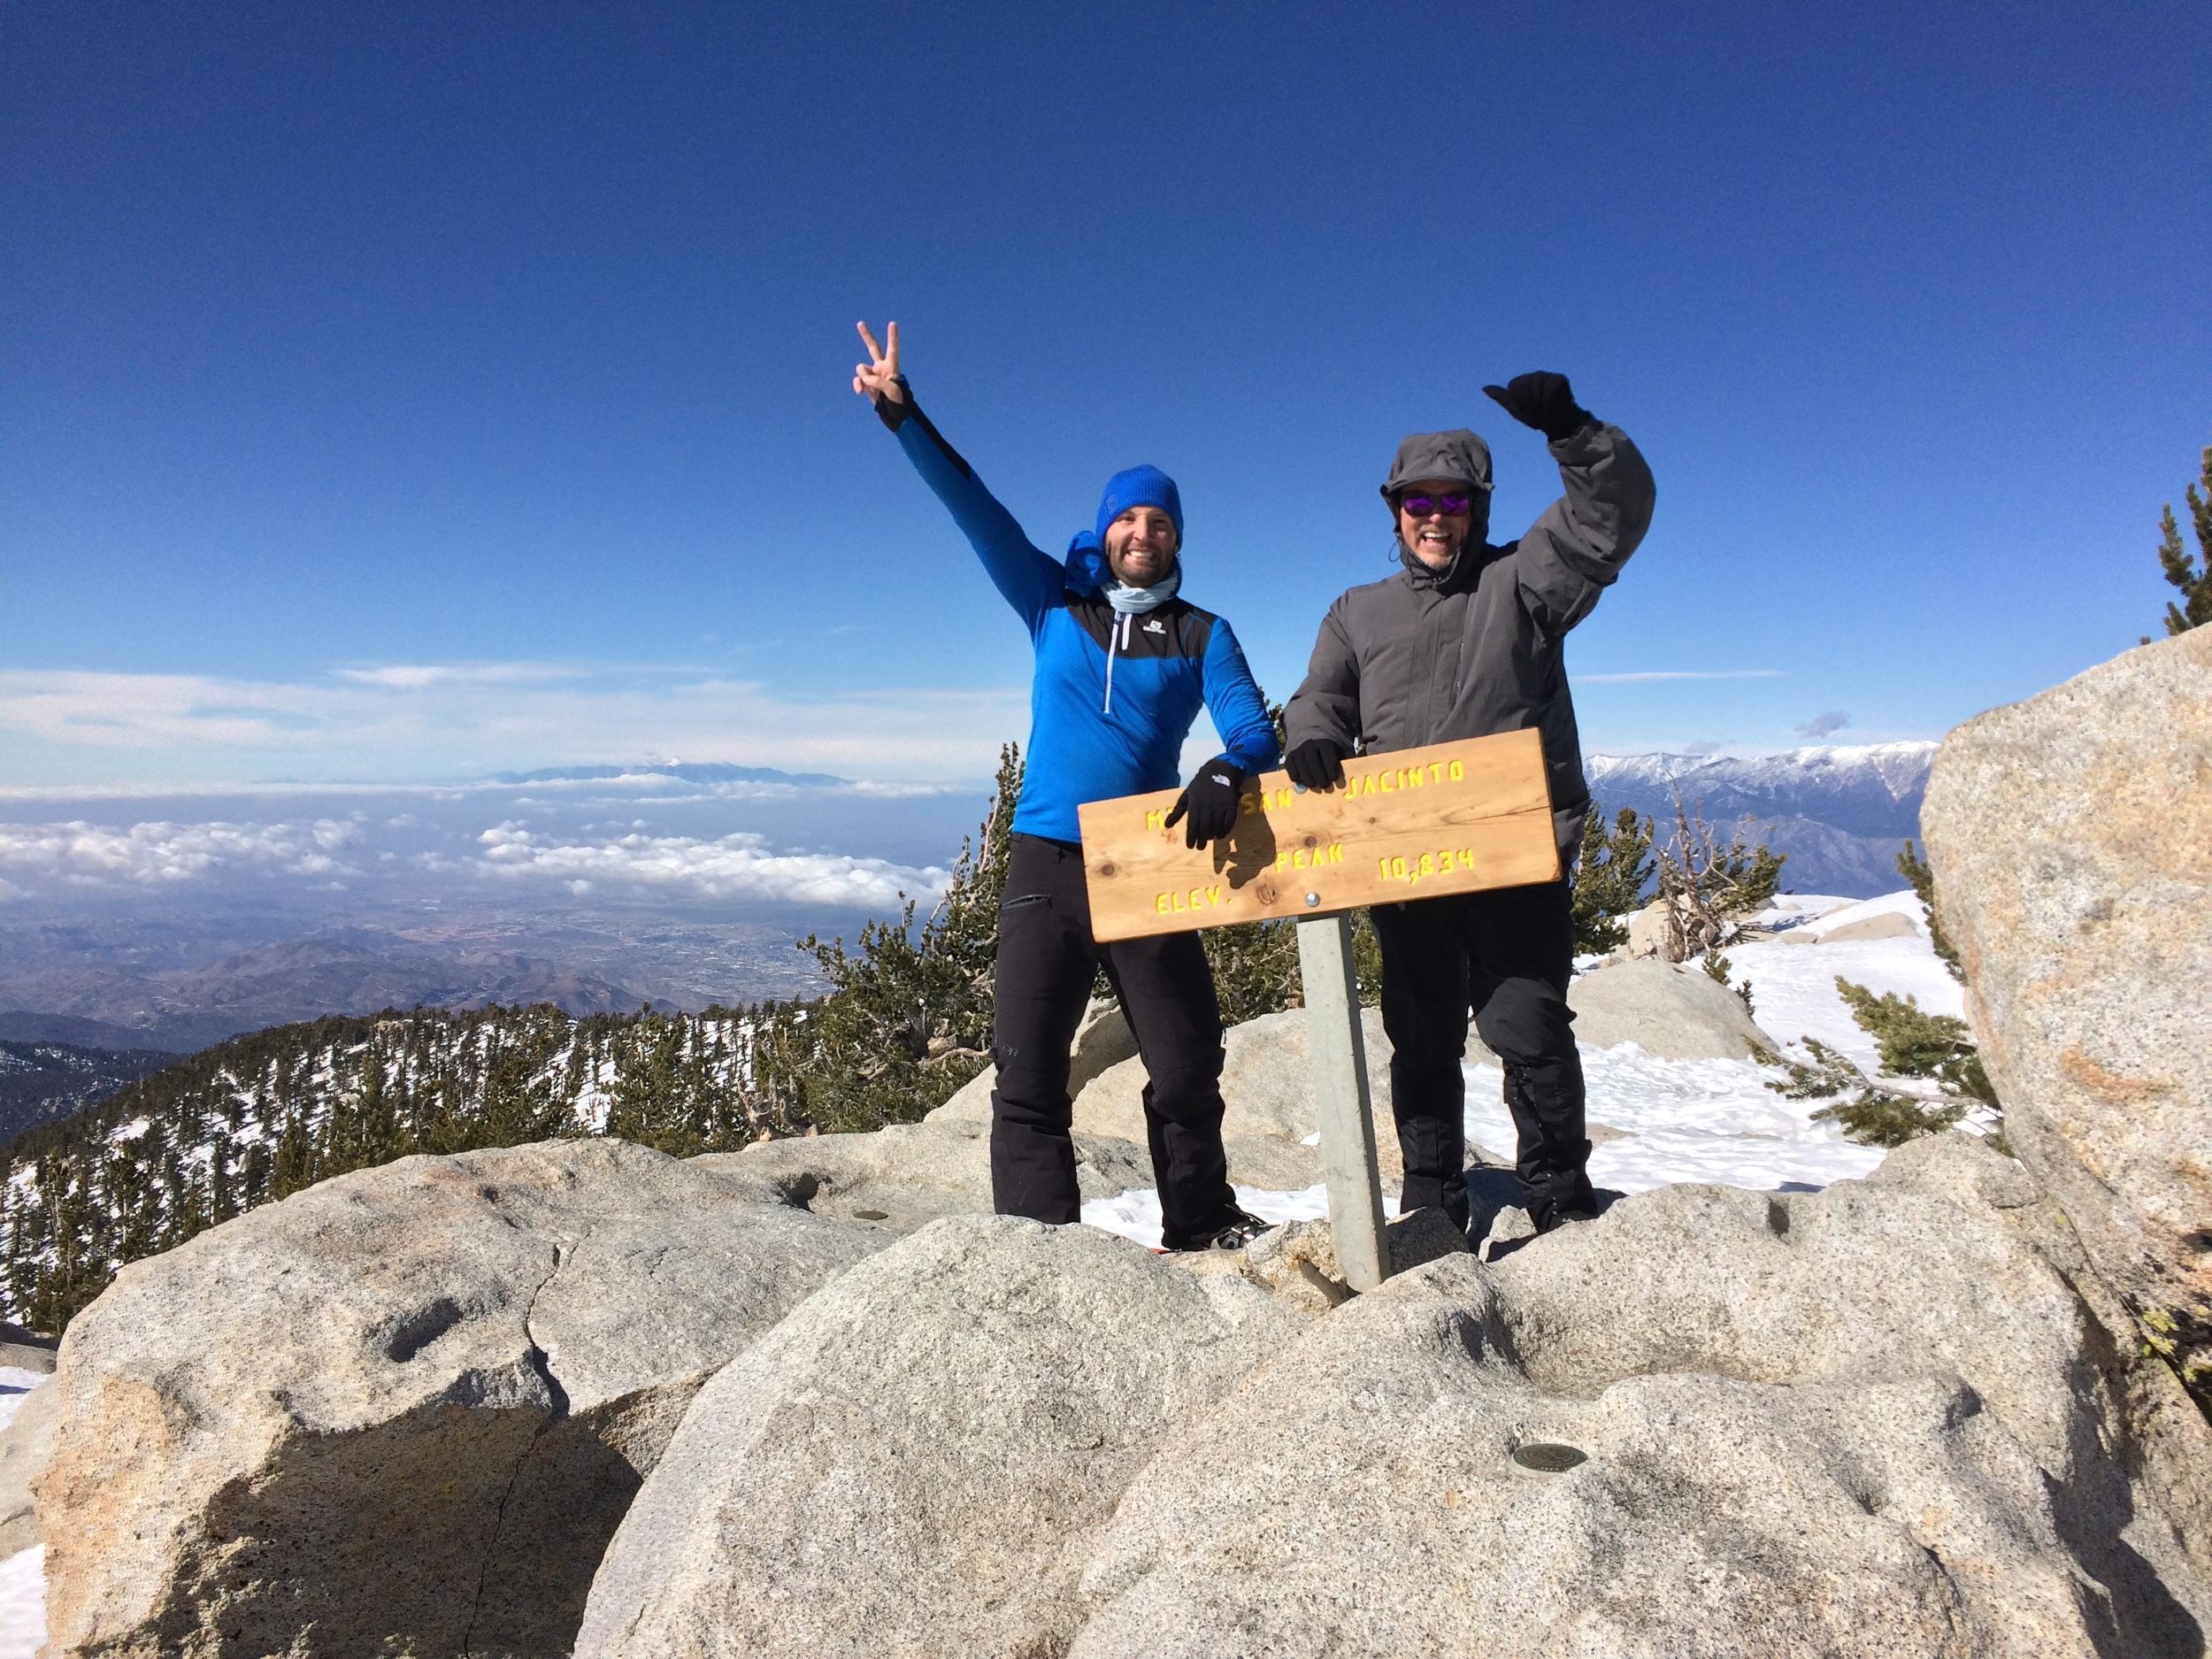 Summit, San Jacinto, January 2016